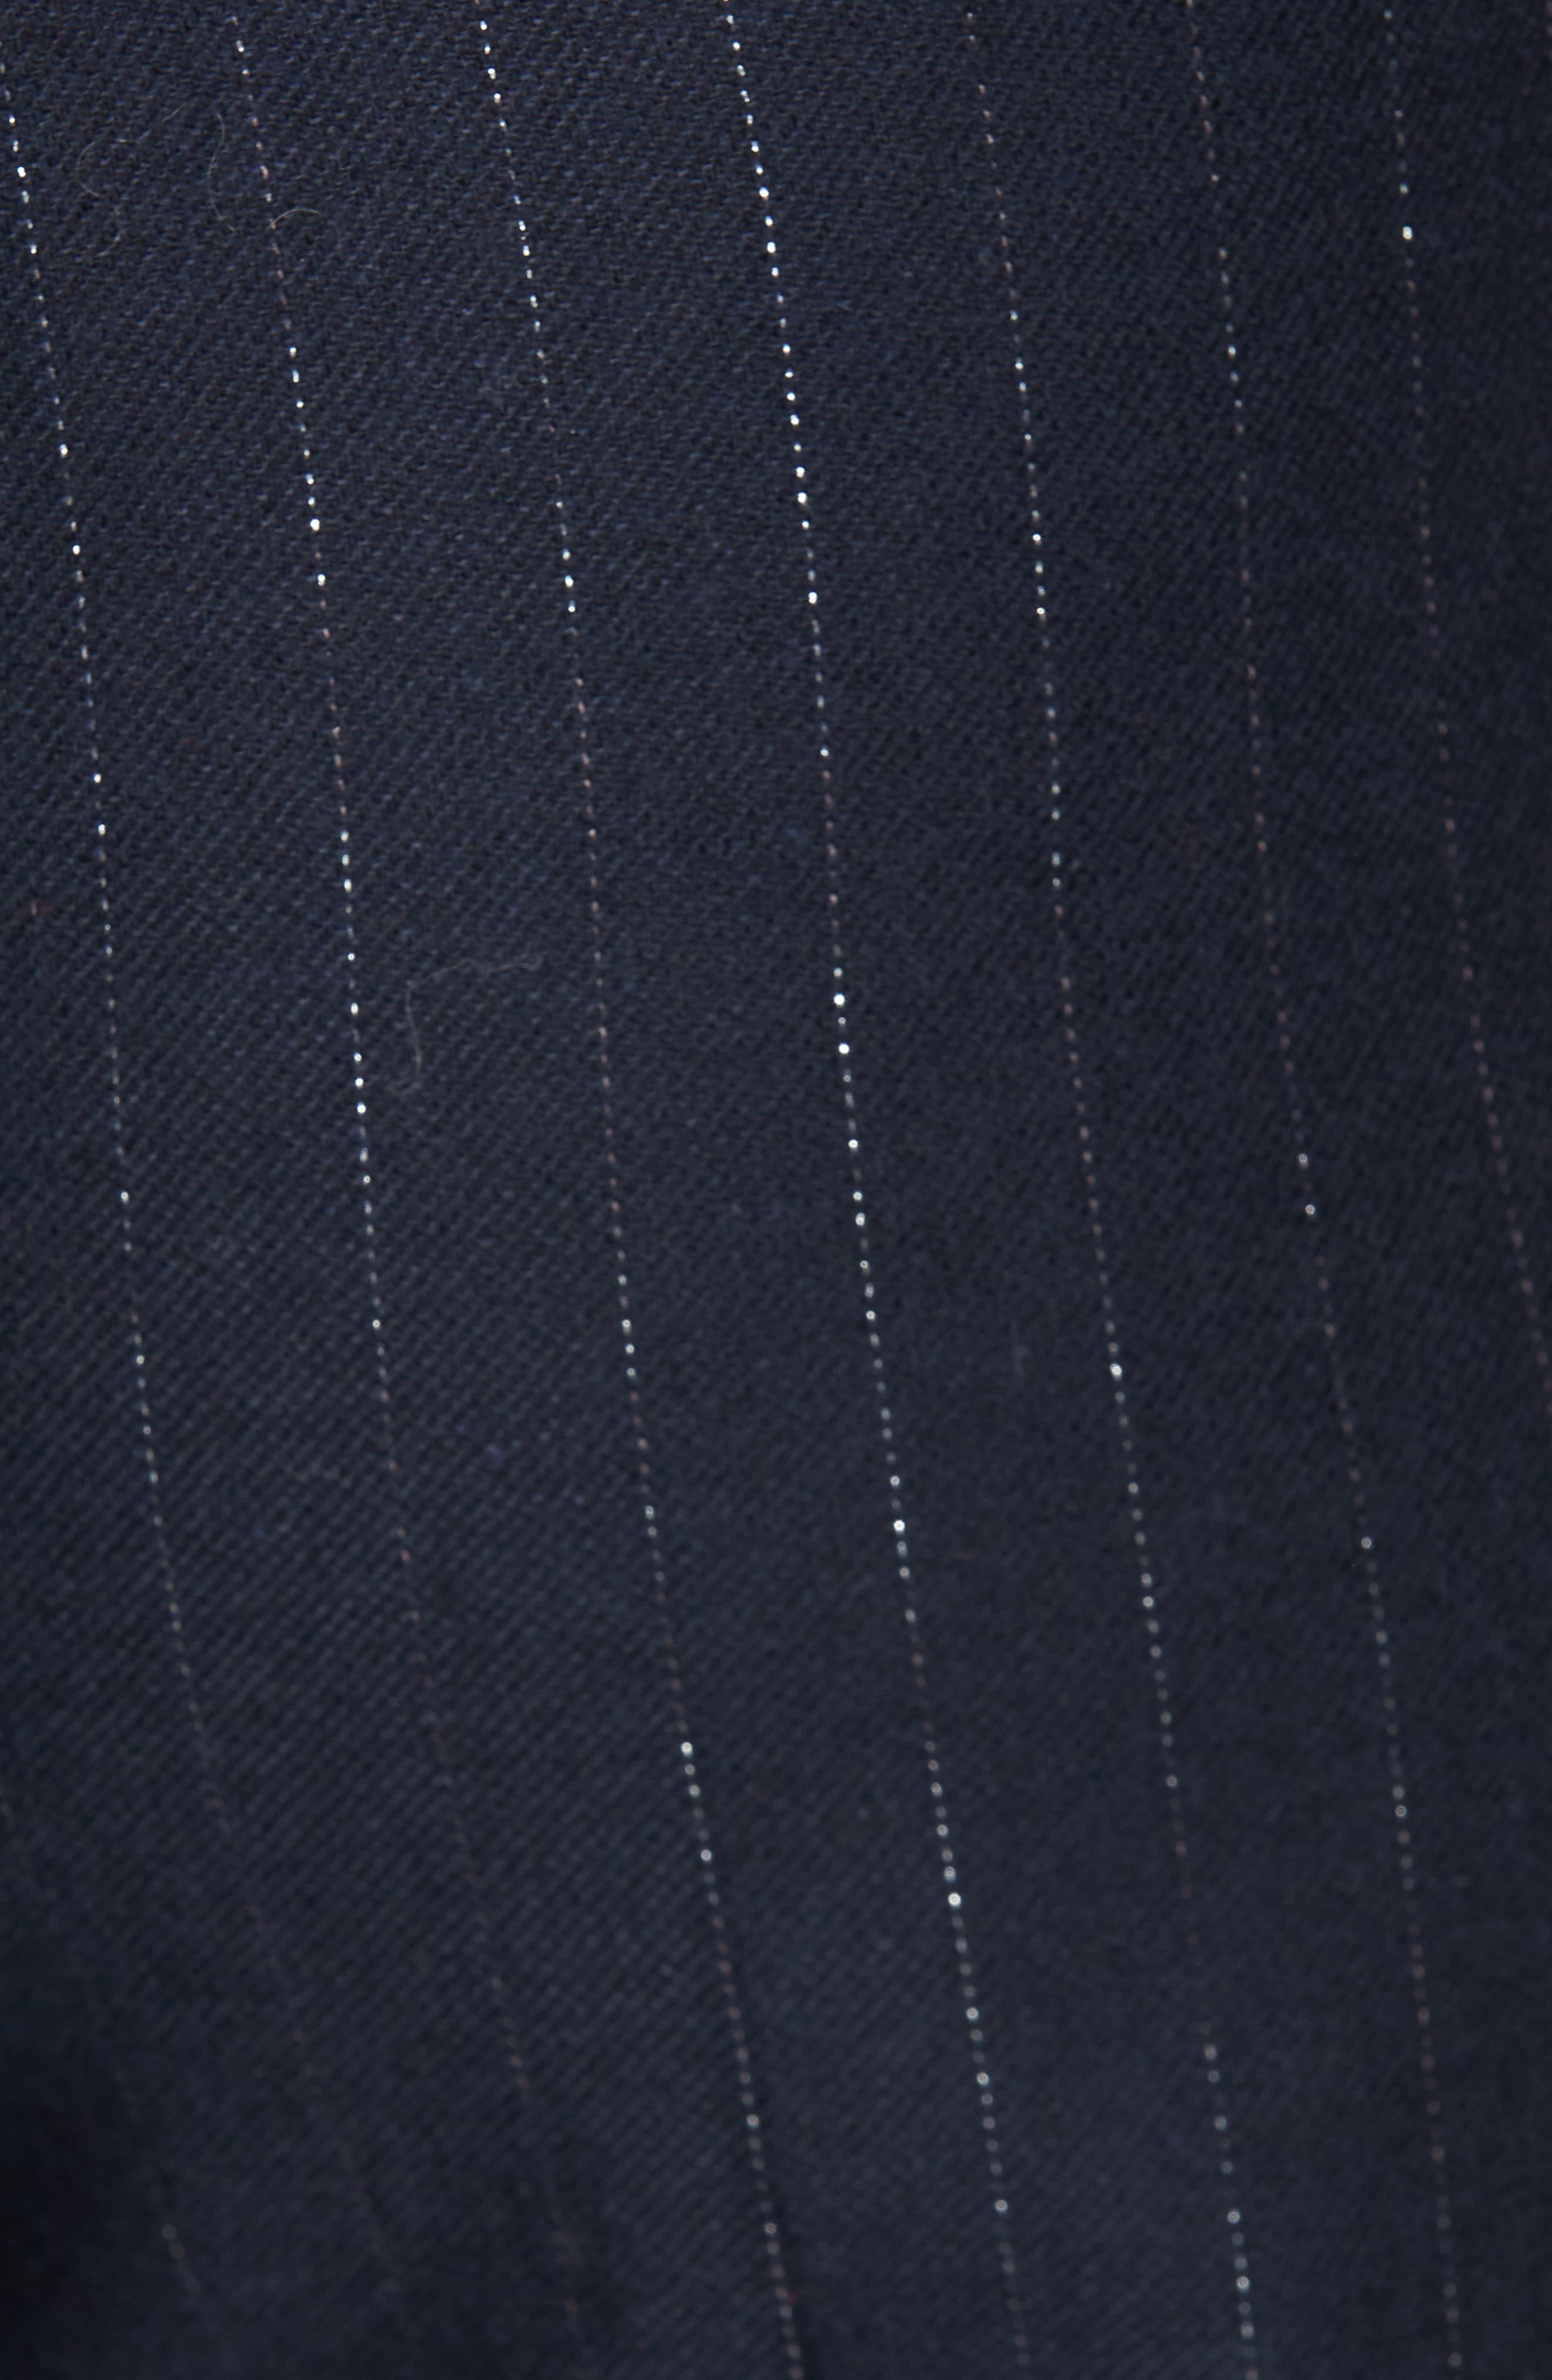 Hagan Trousers,                             Alternate thumbnail 6, color,                             NAVY